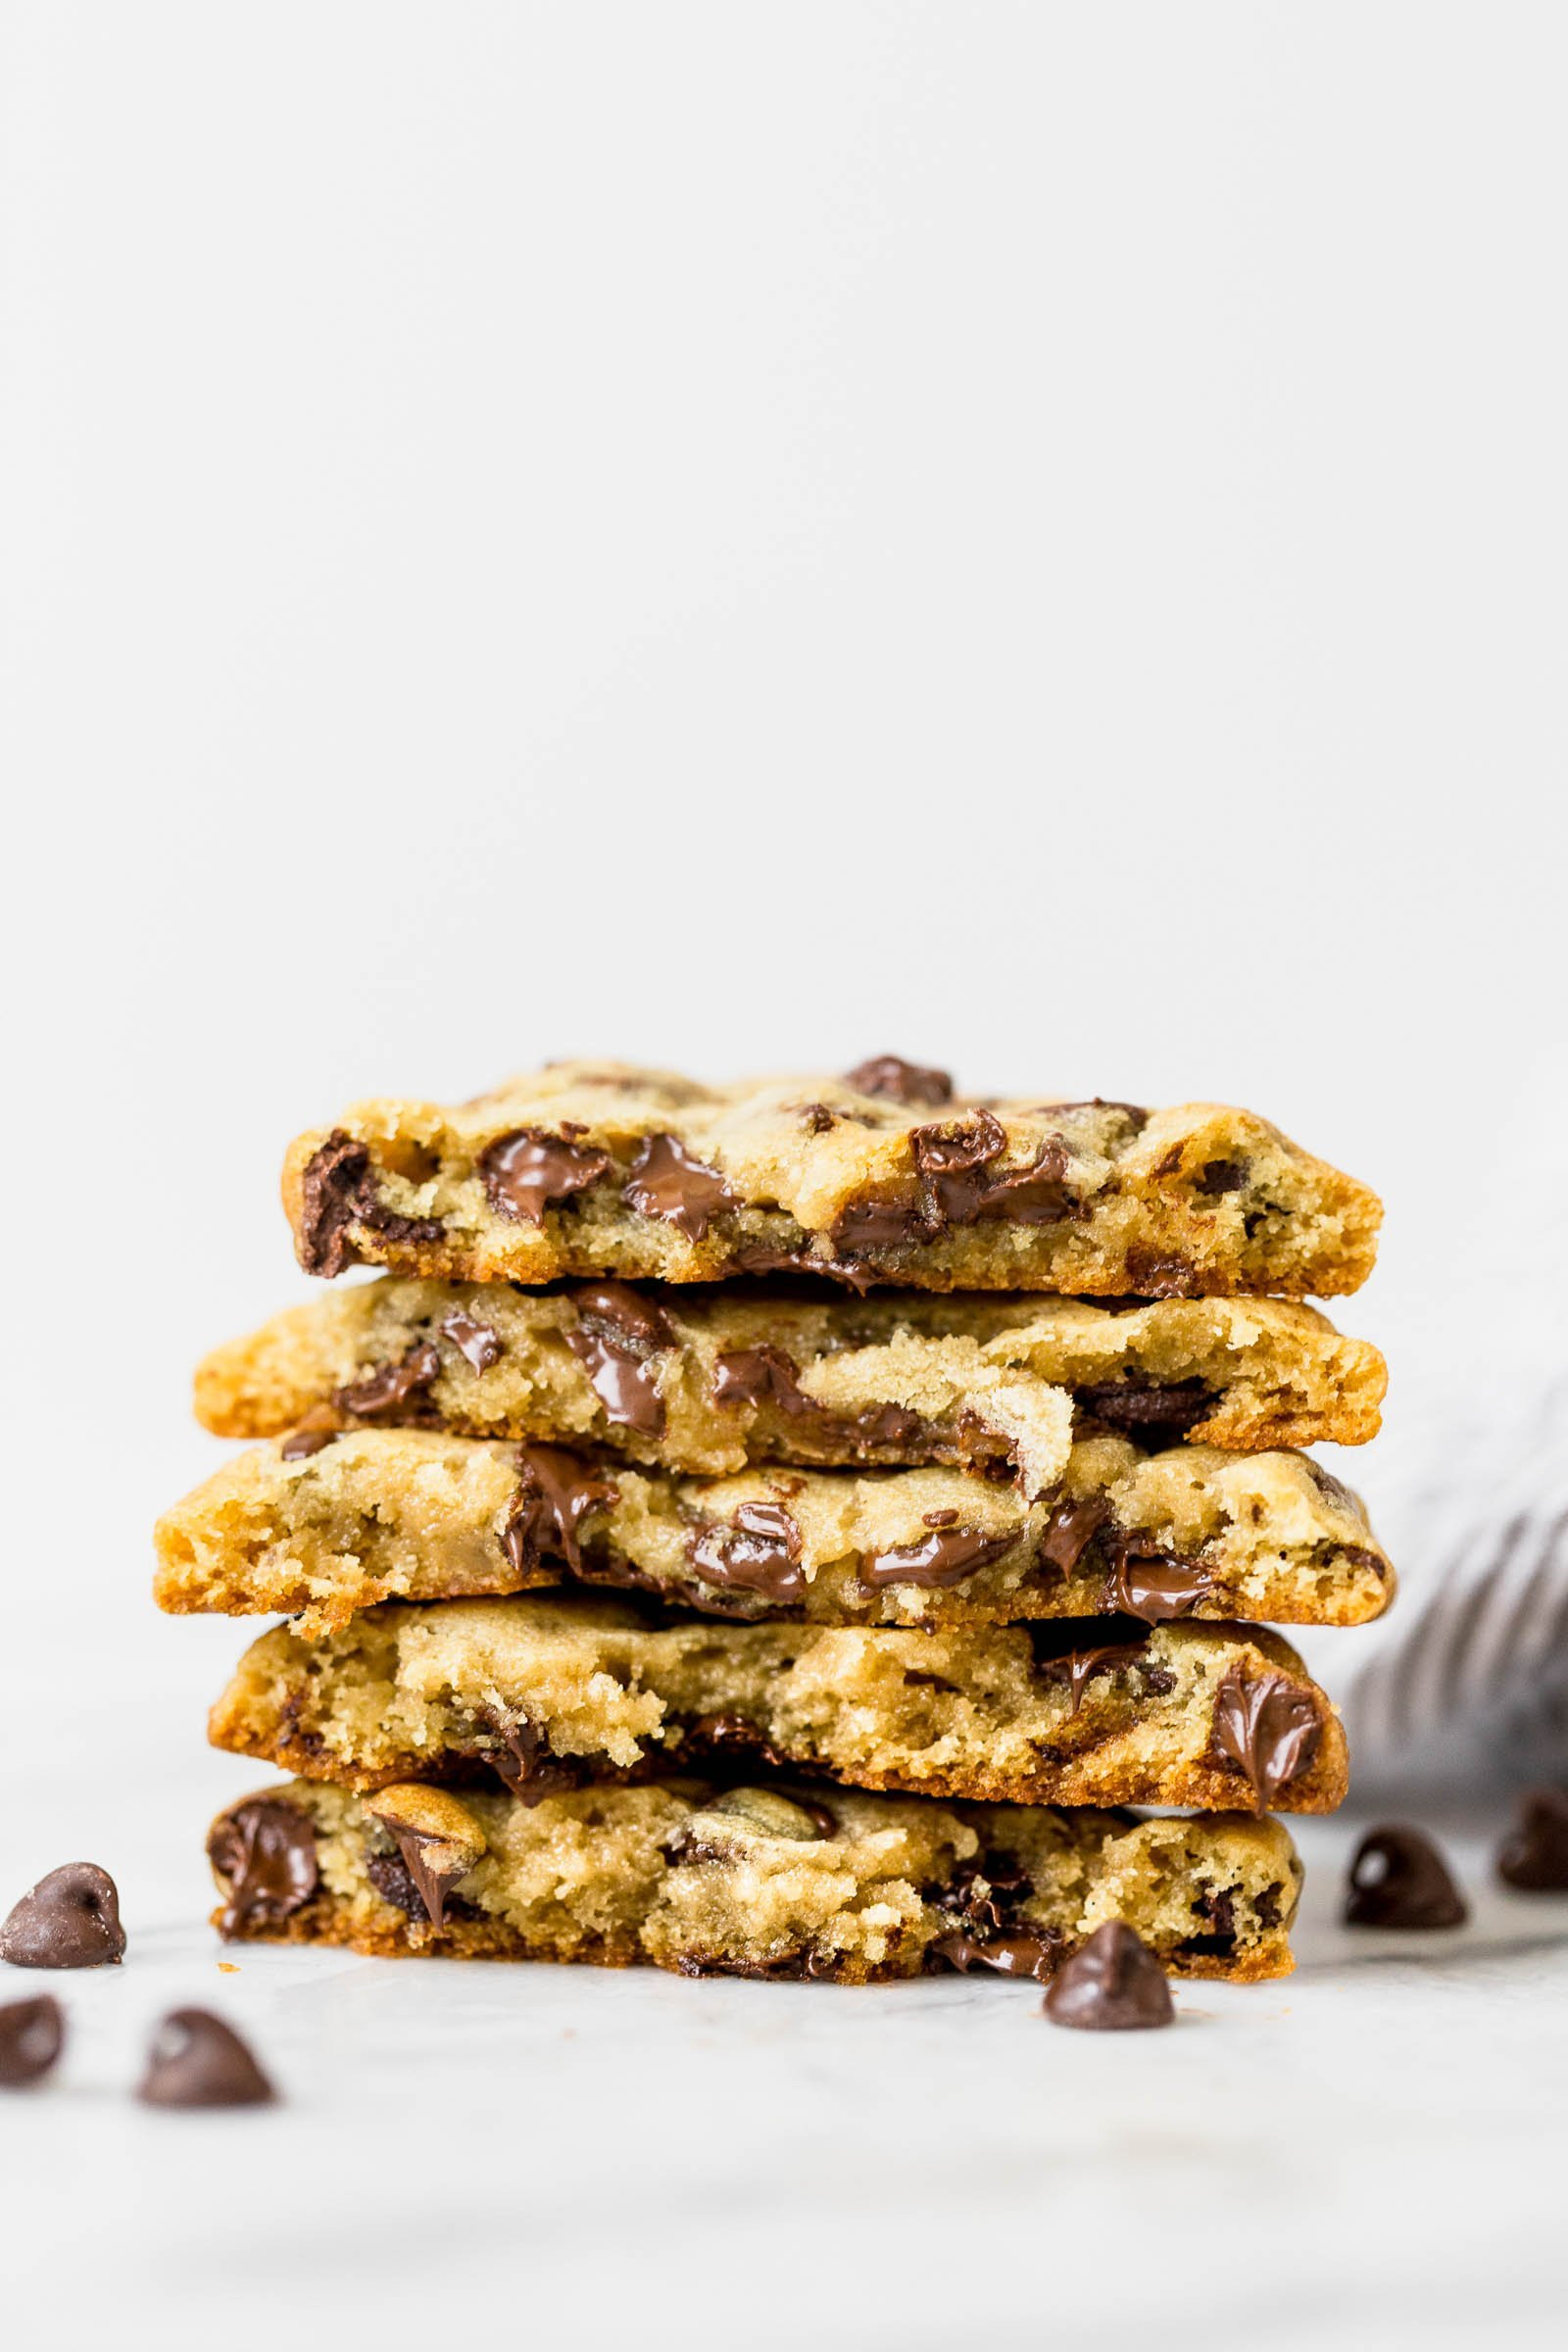 Best ooey gooey bakery style chocolate chip cookies stacked